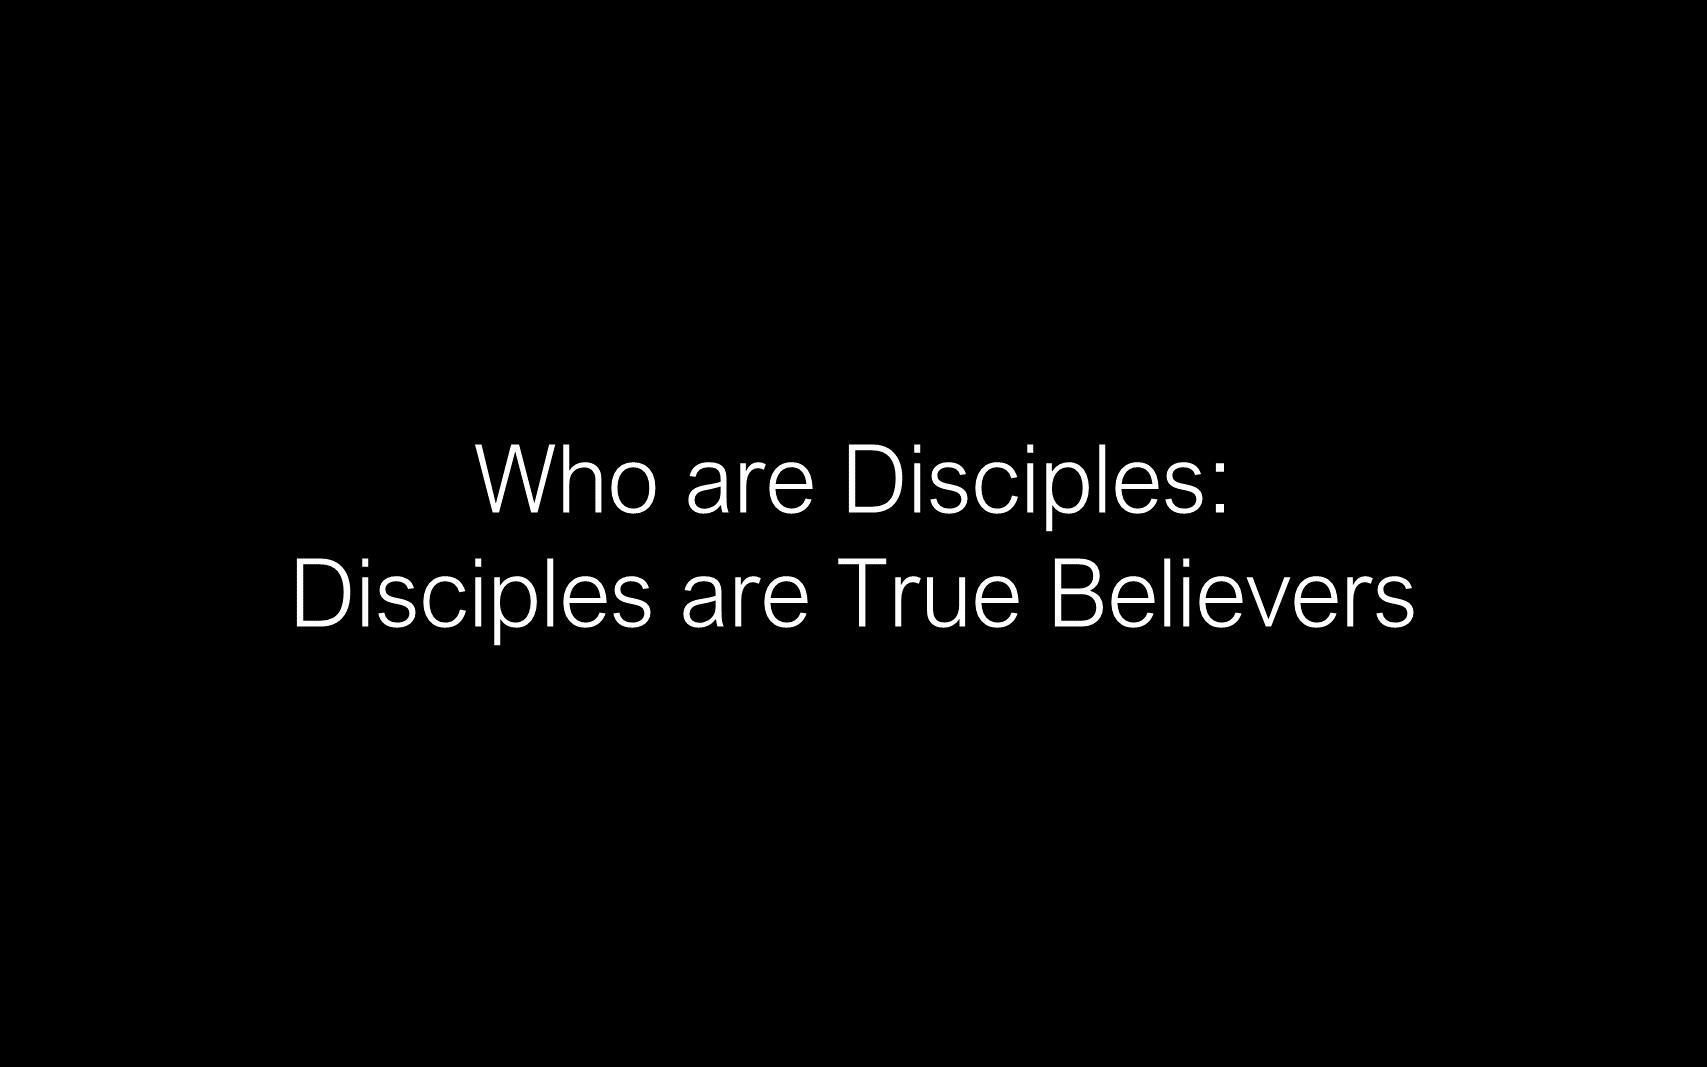 ESH-11 - The Discipline Of Disciple-Making - Disciples - Follow Christ & Make Disciples (12)